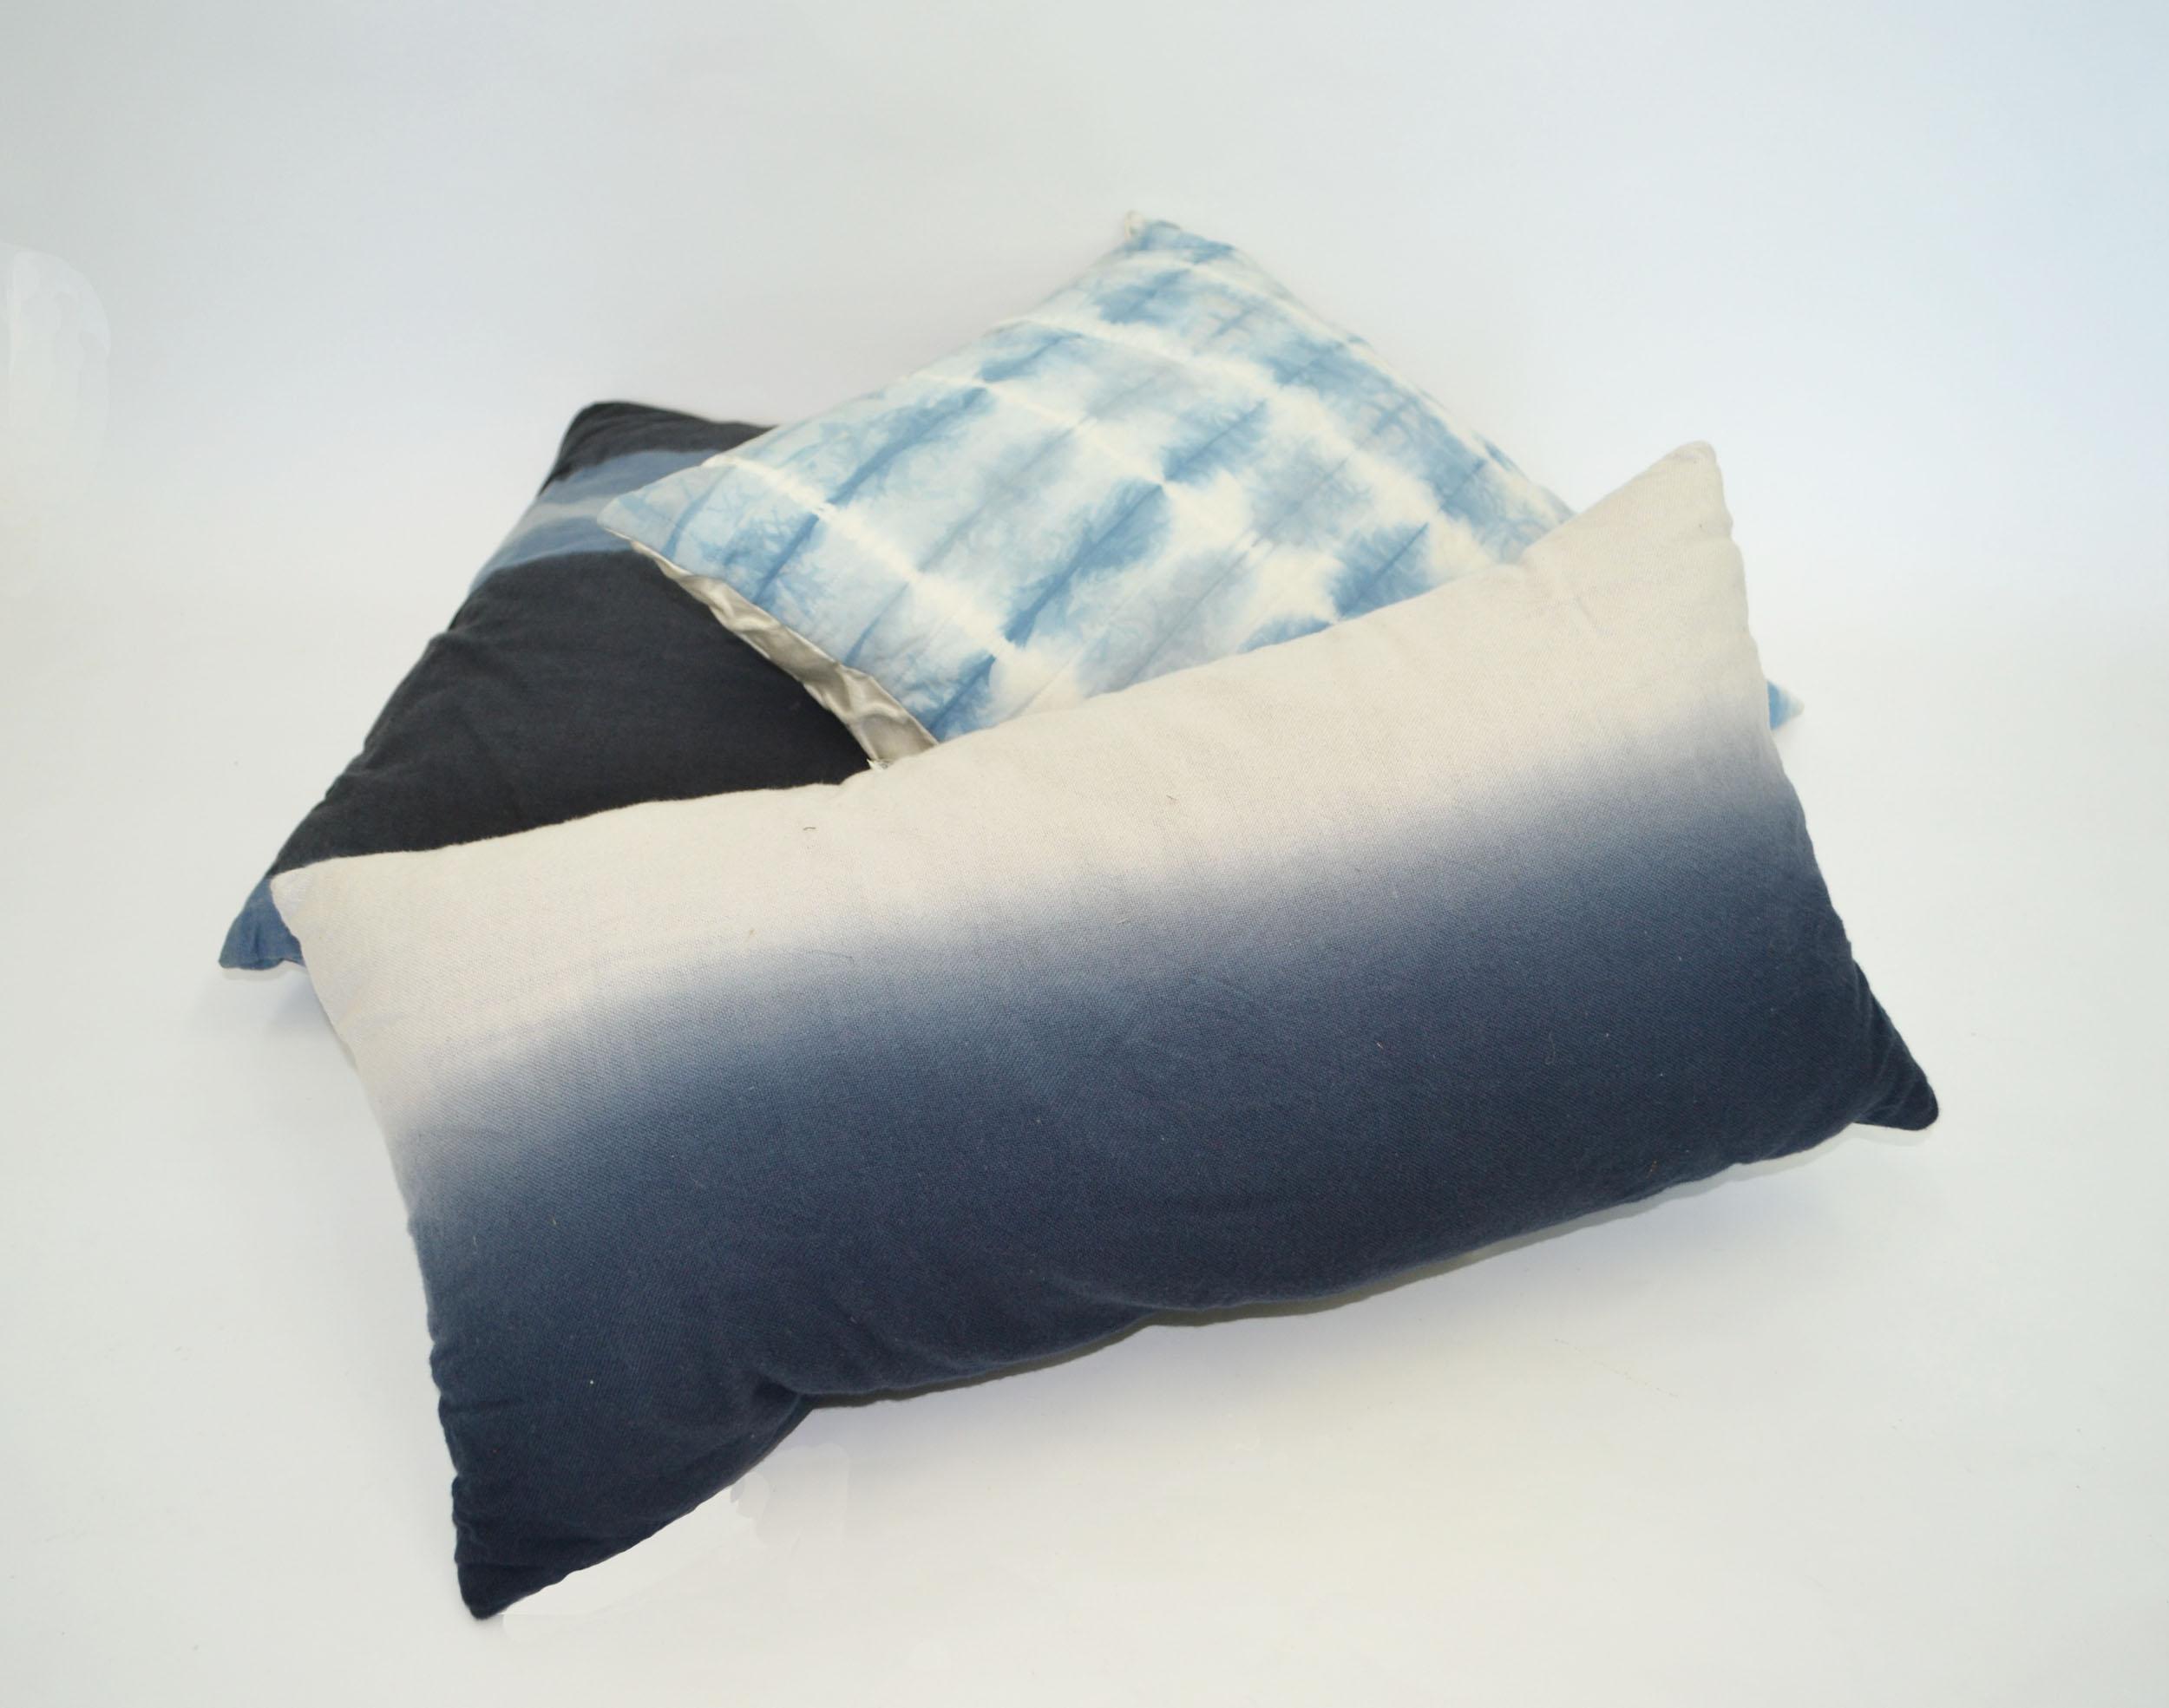 blue tie-dye pillow   Quantity: 4  Price: $10.00